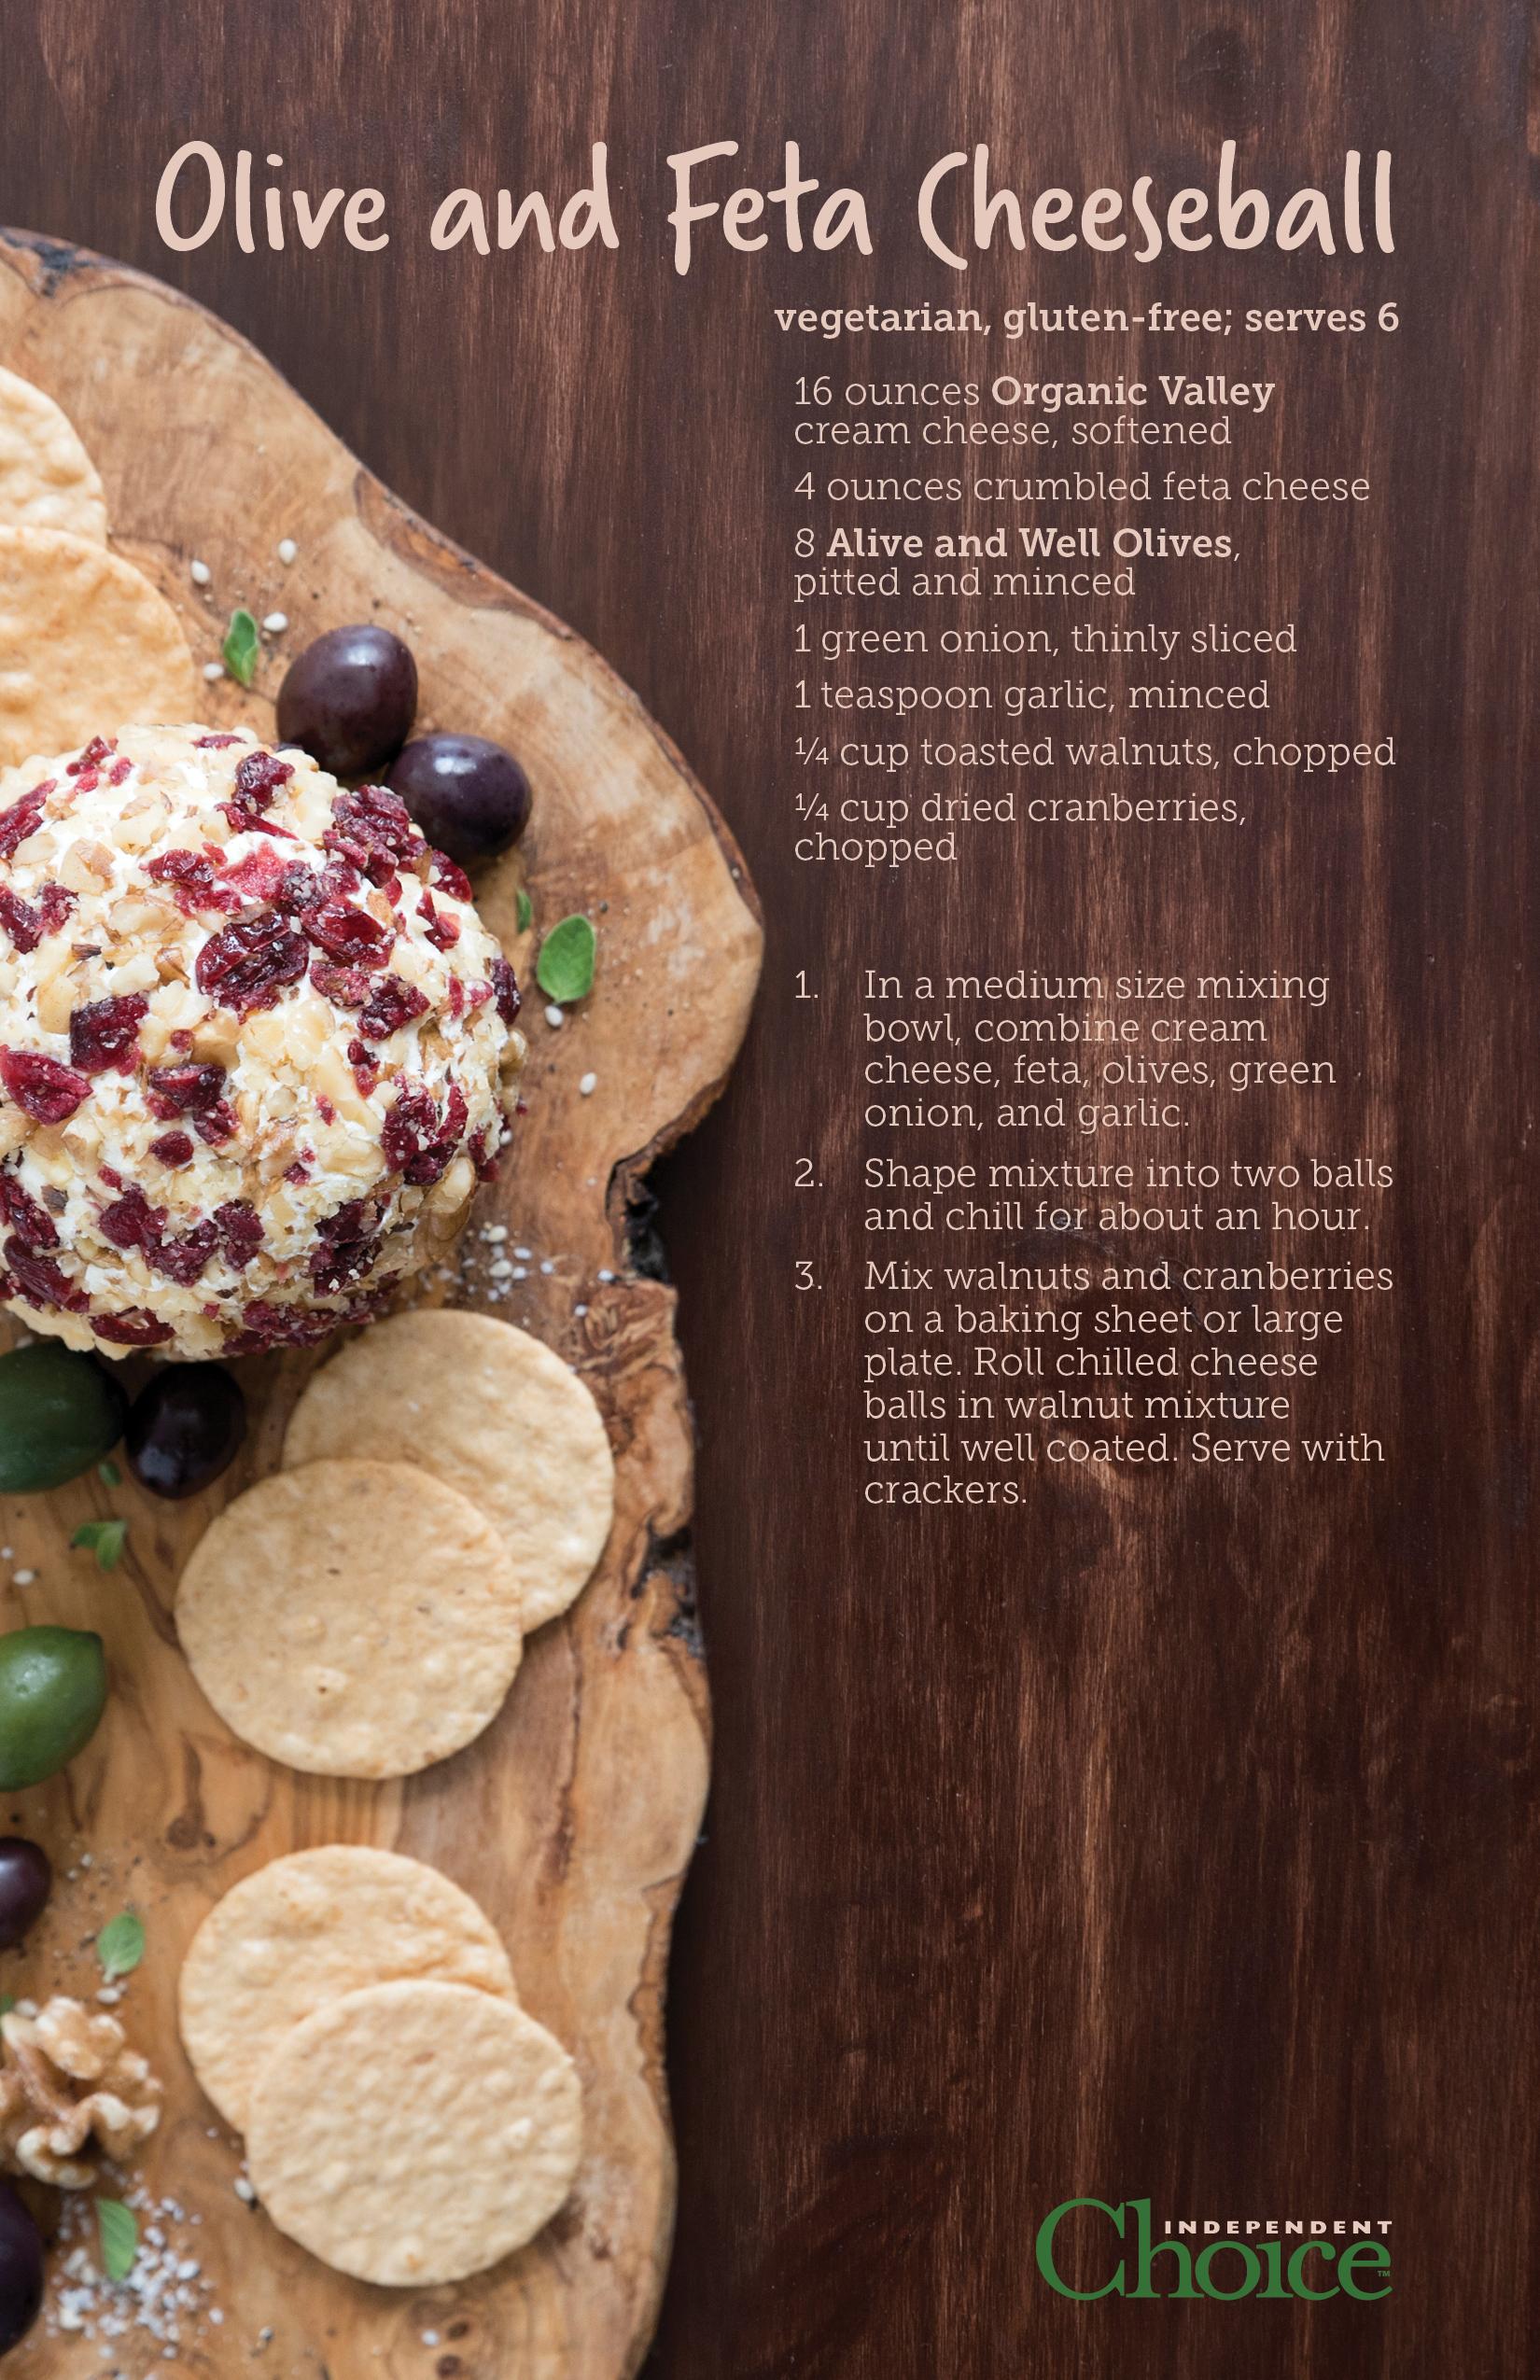 2017 Holiday Olive and Feta Cheeseball.jpg